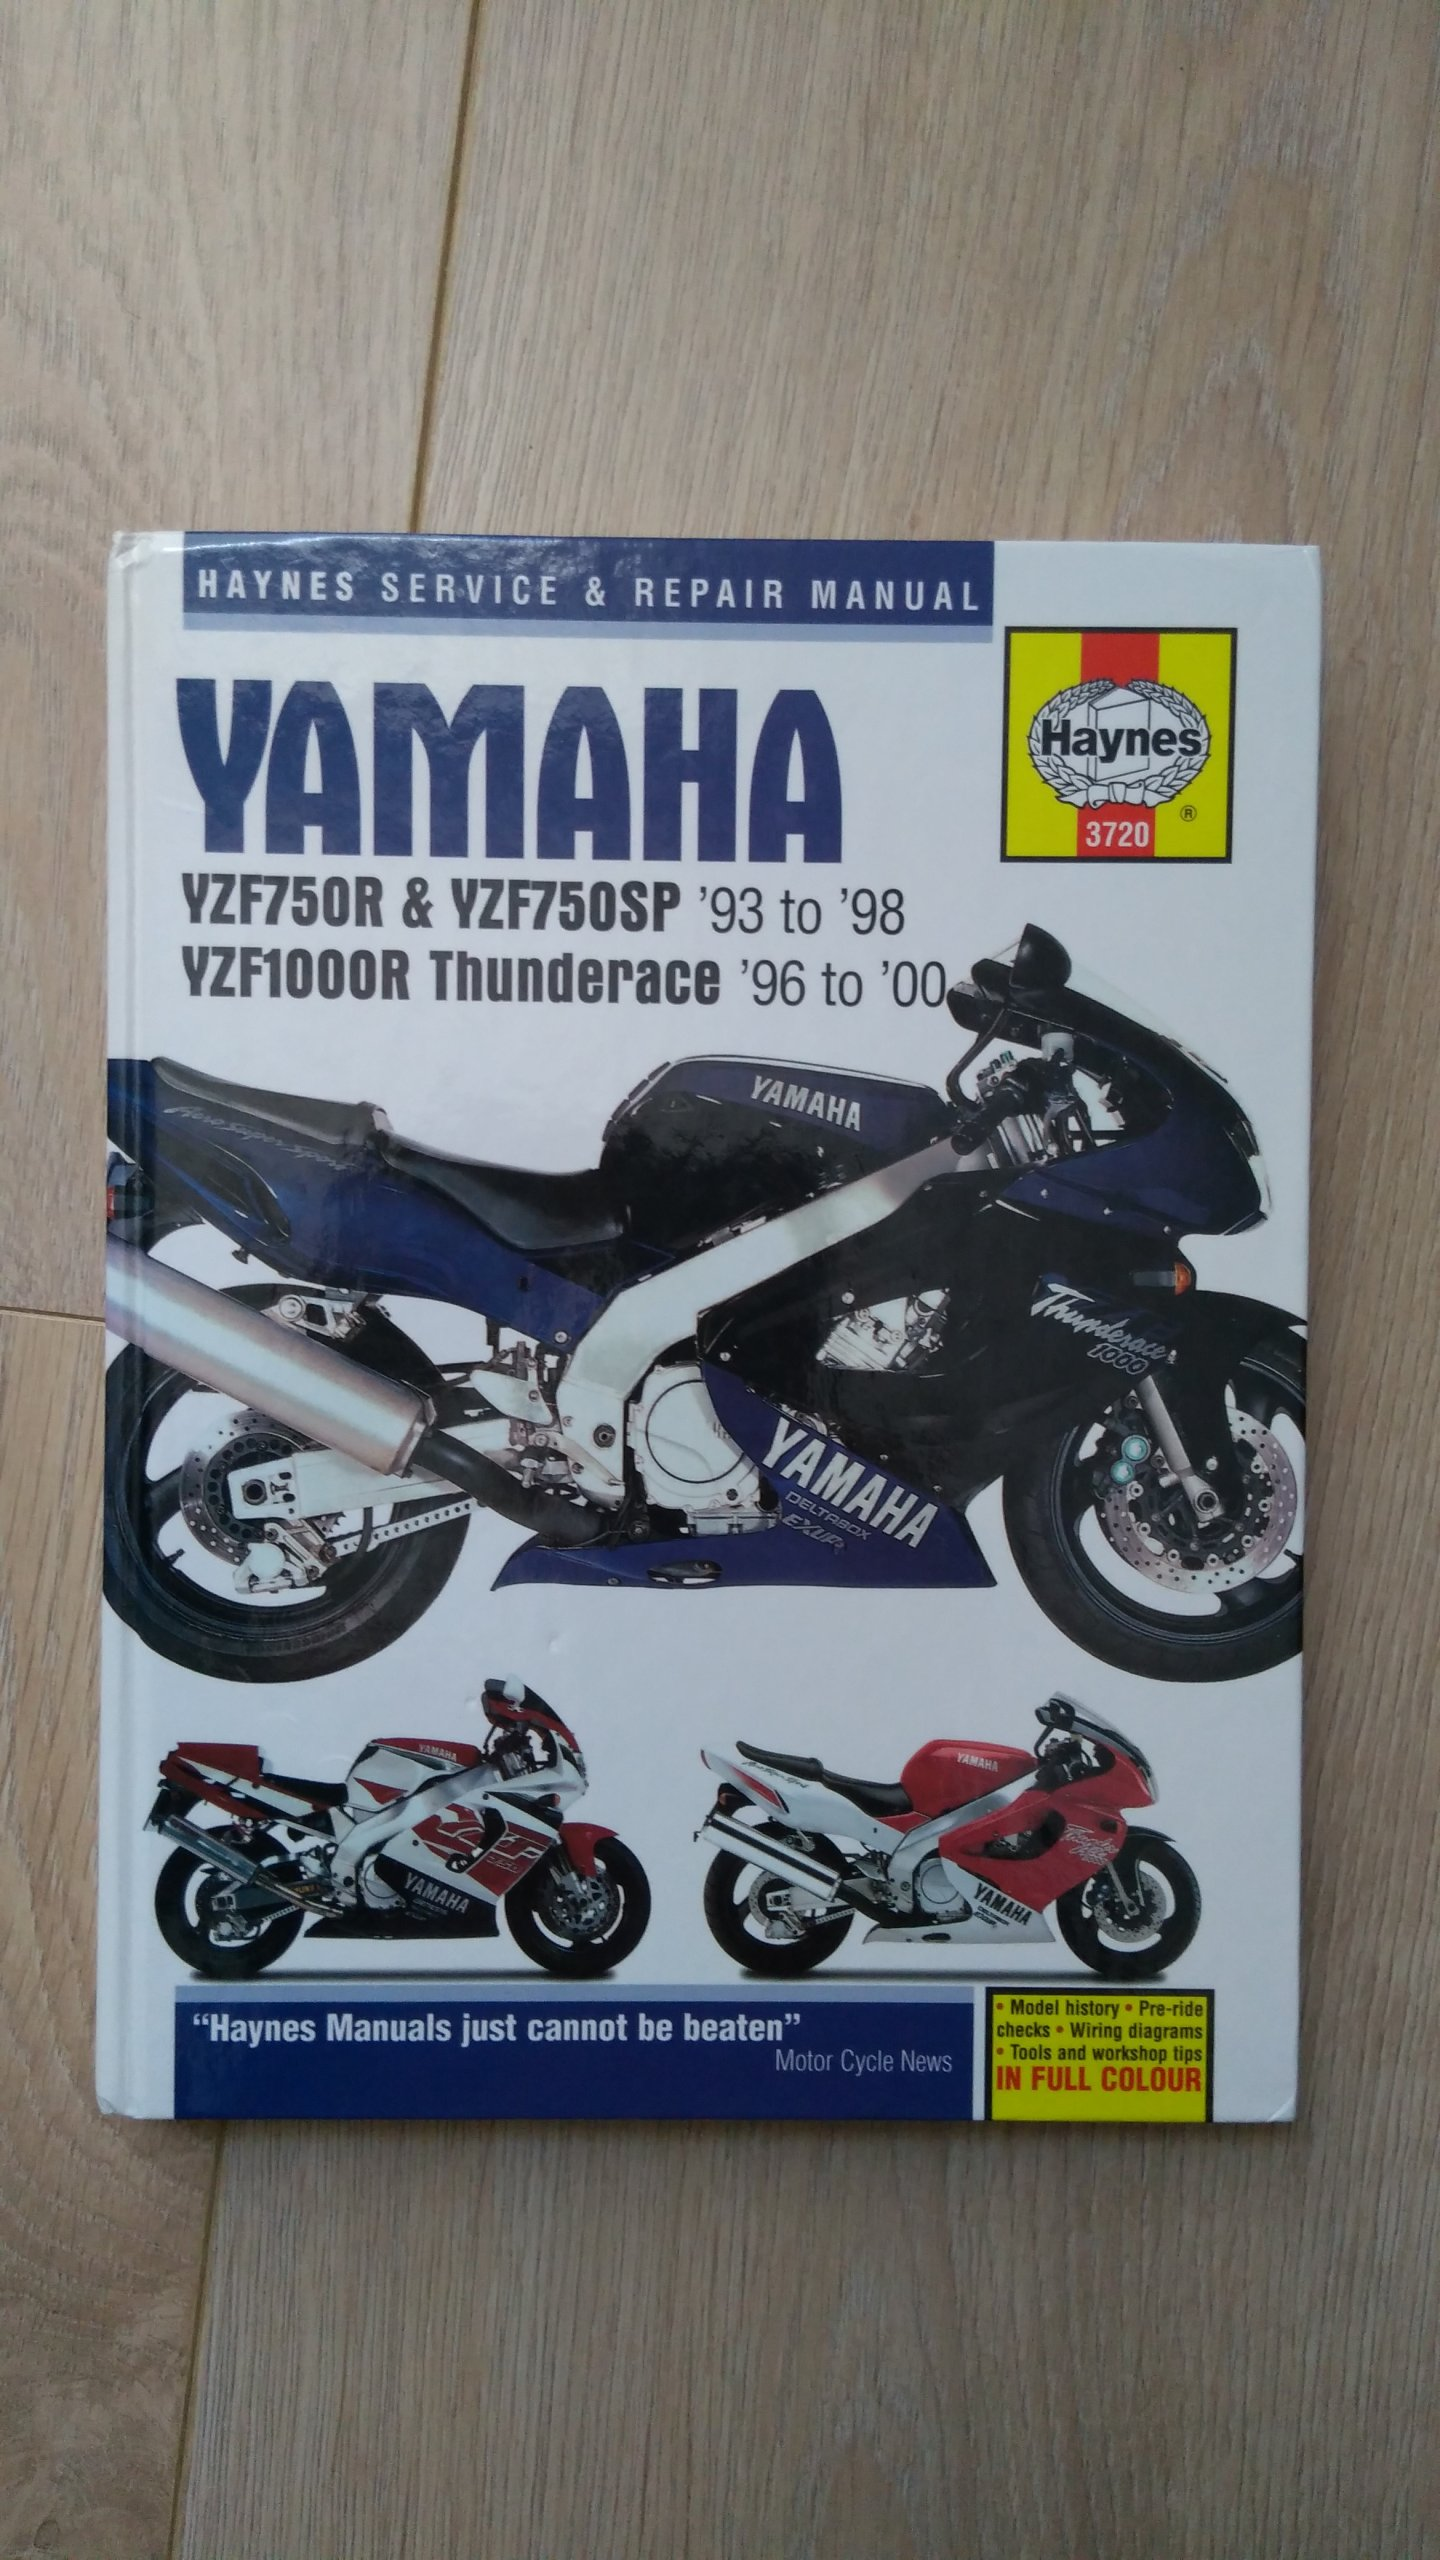 haynes yzf750r, yzf750sp i yzf1000r thunderace